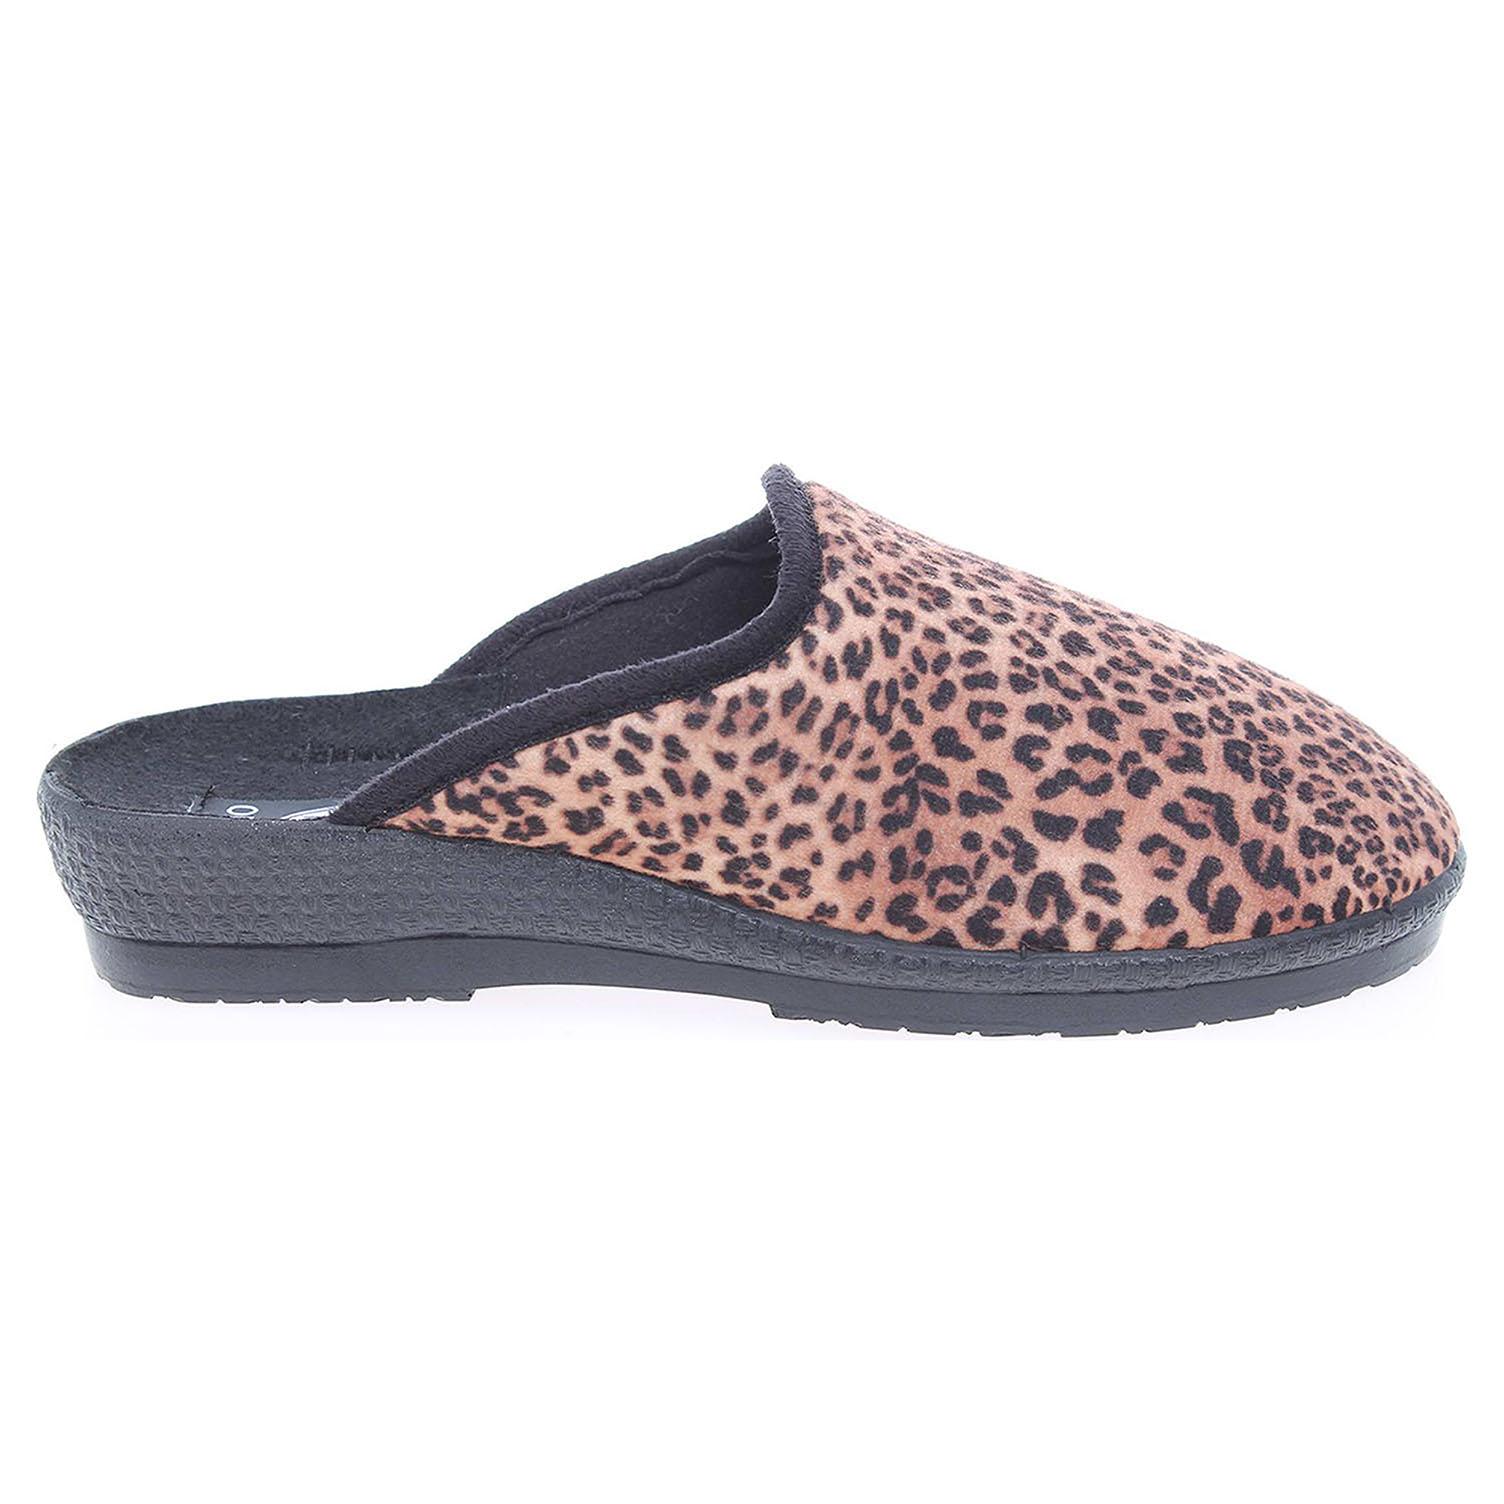 Rogallo dámské pantofle 3360-029 hnědé 41